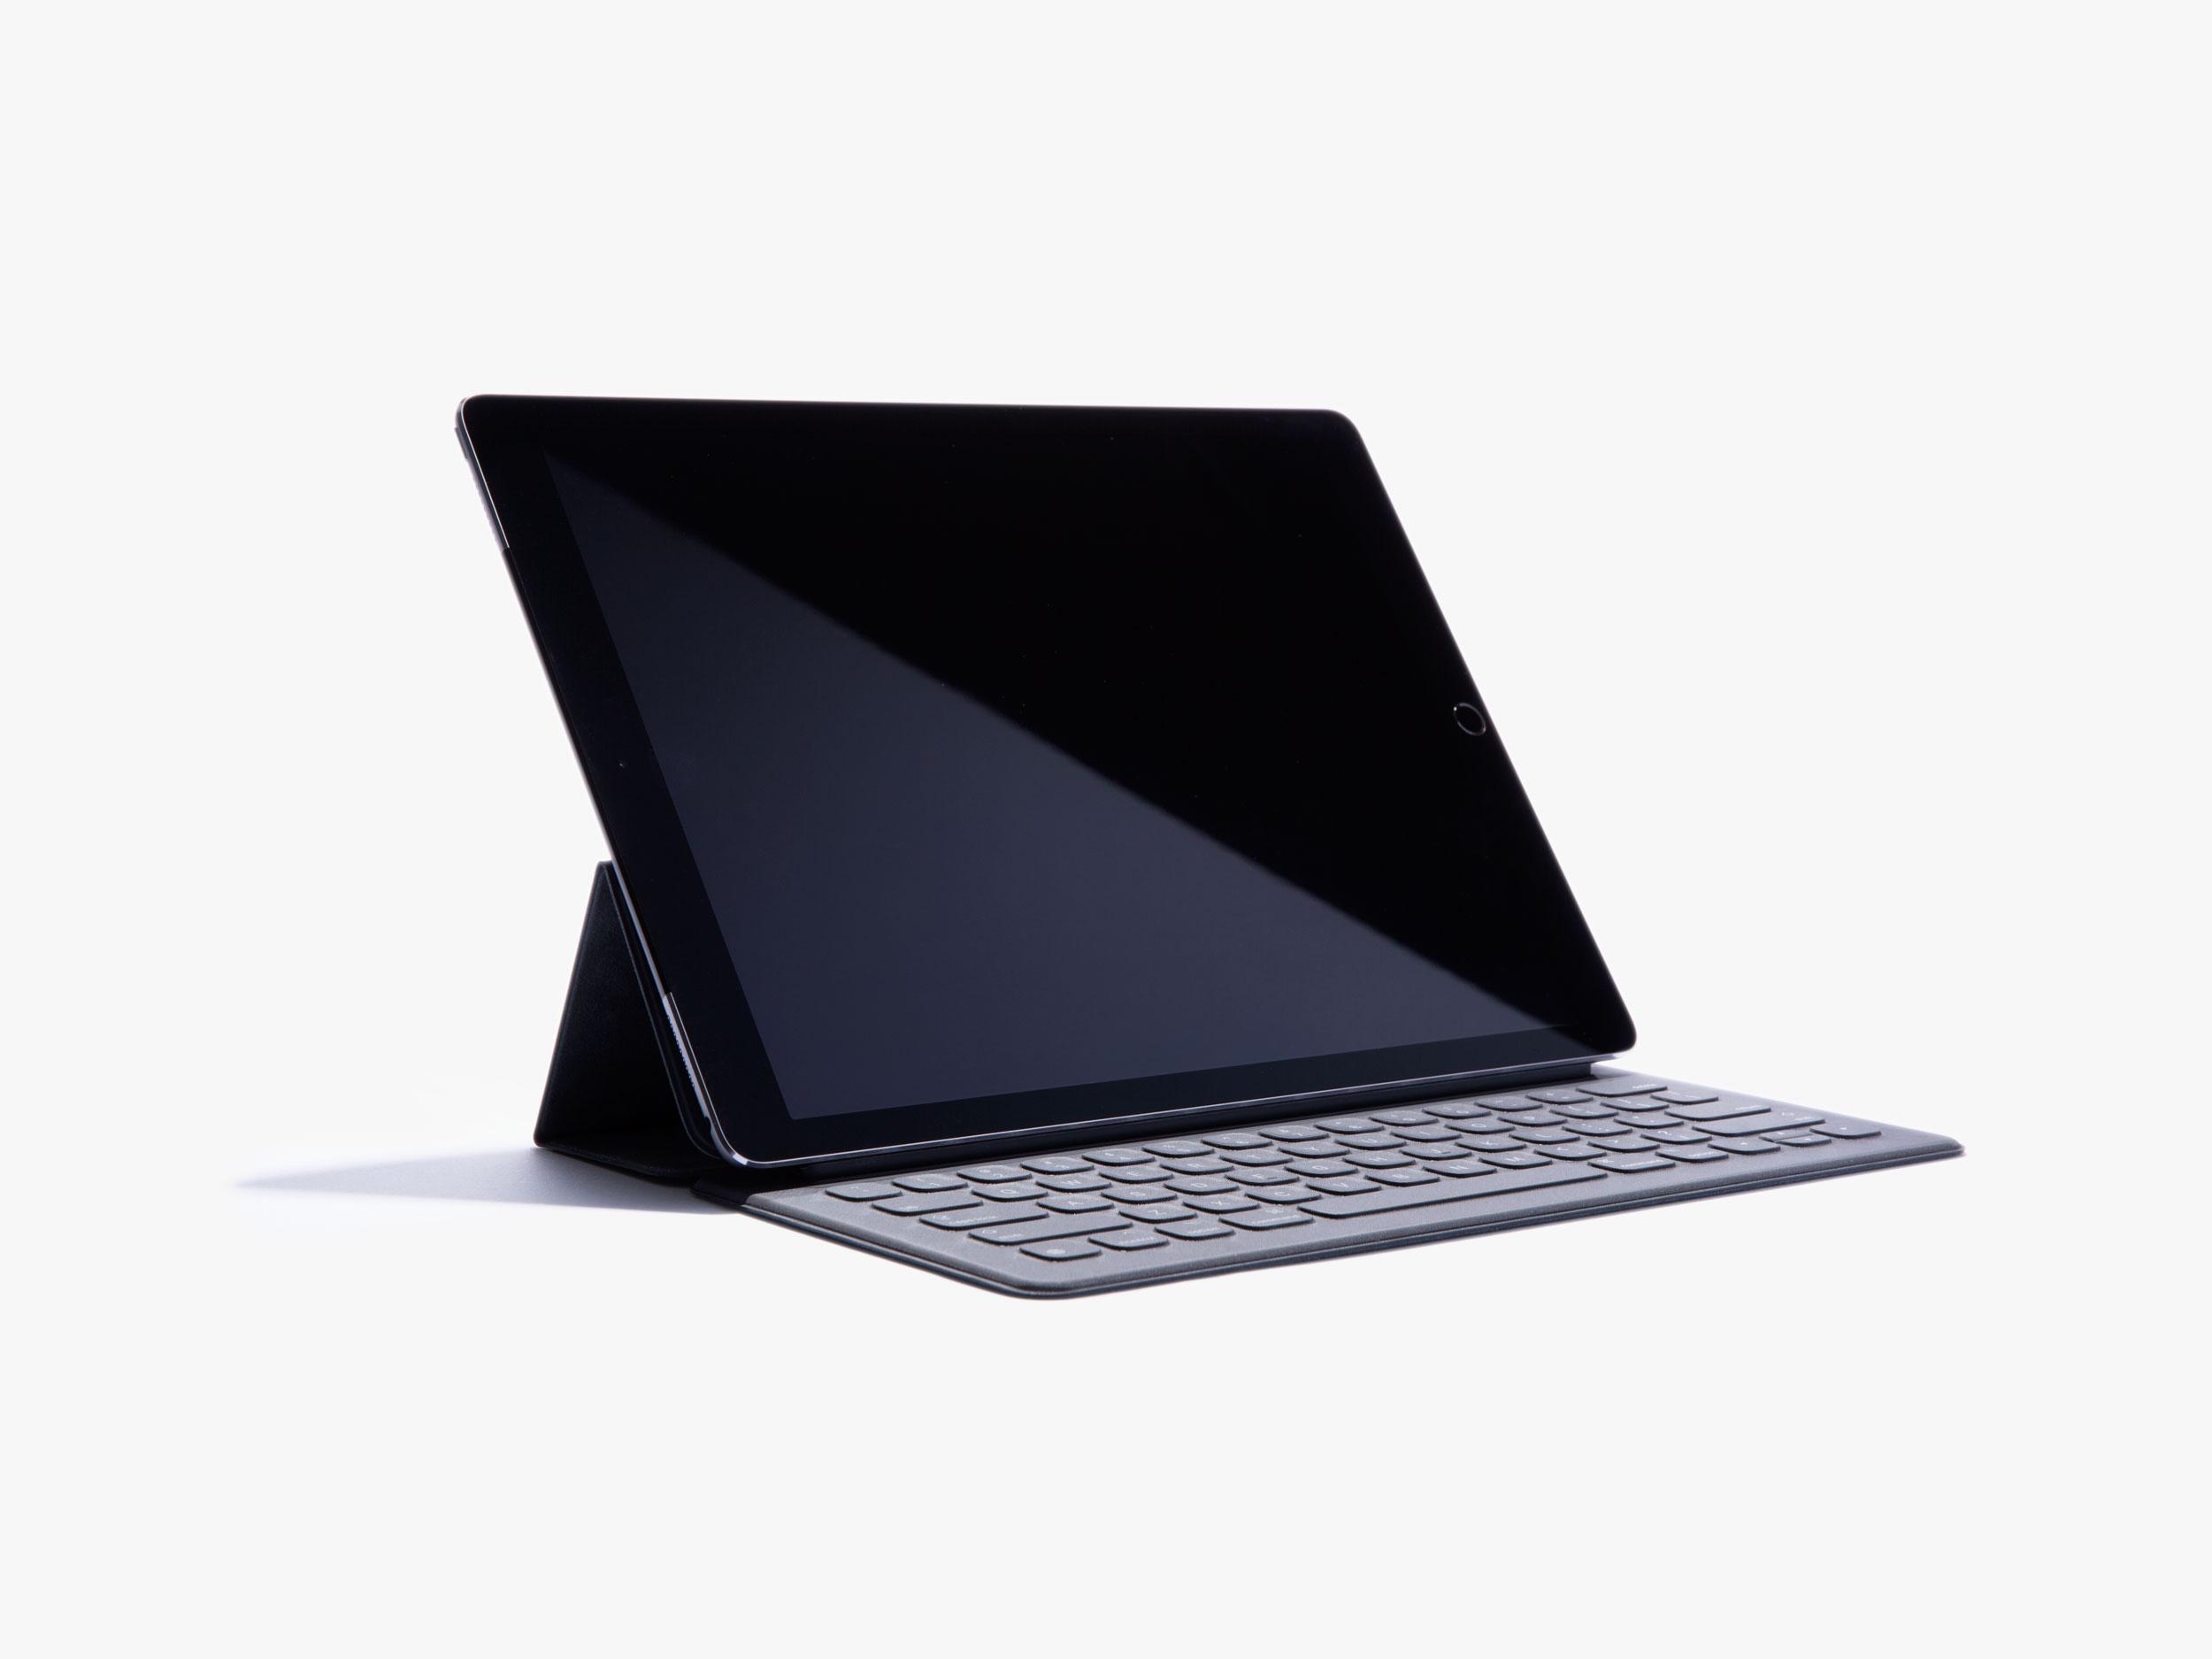 iPadpro-gallery18